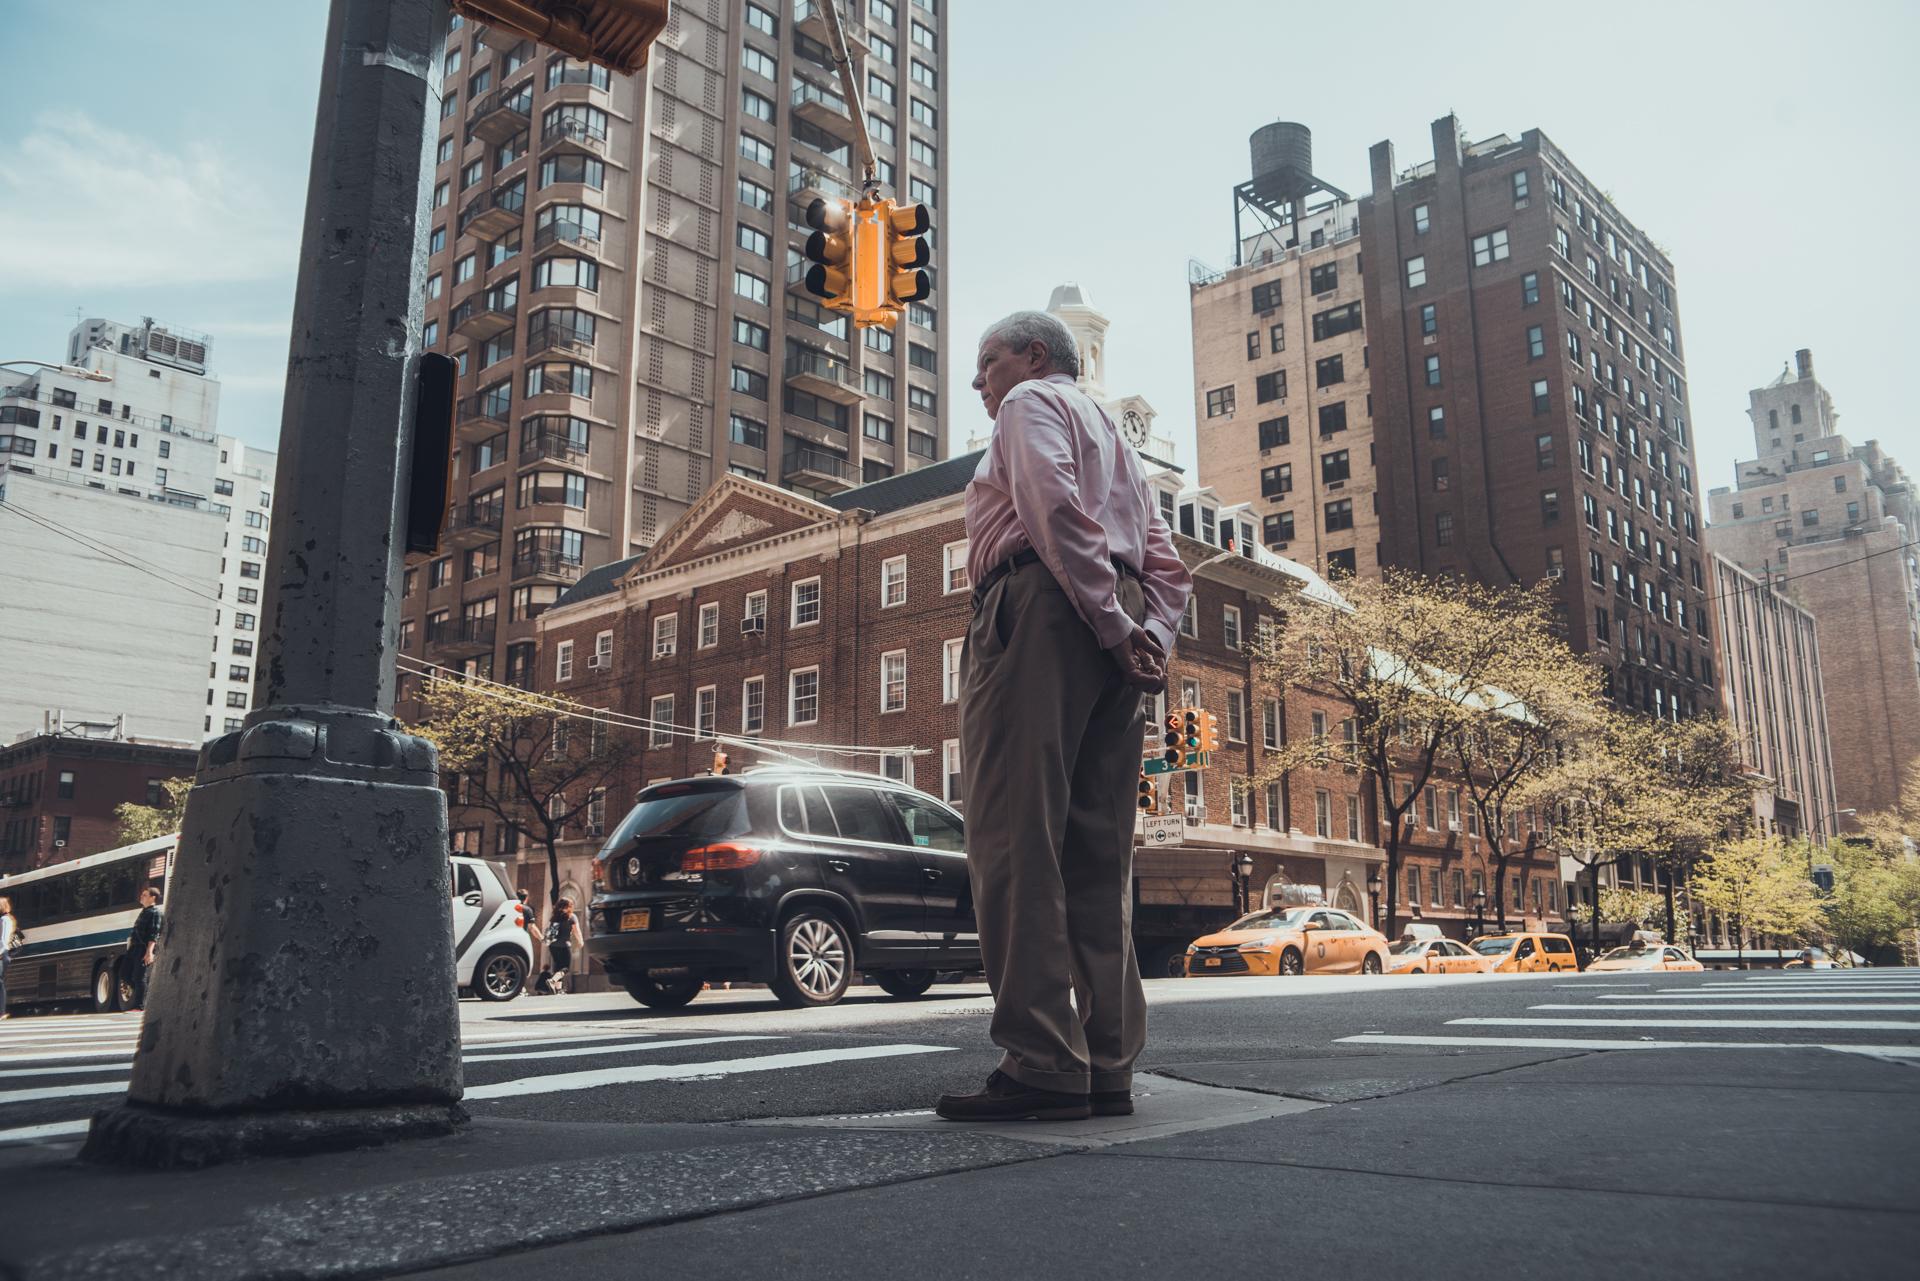 NYC_stijn_hoekstra-111.jpg